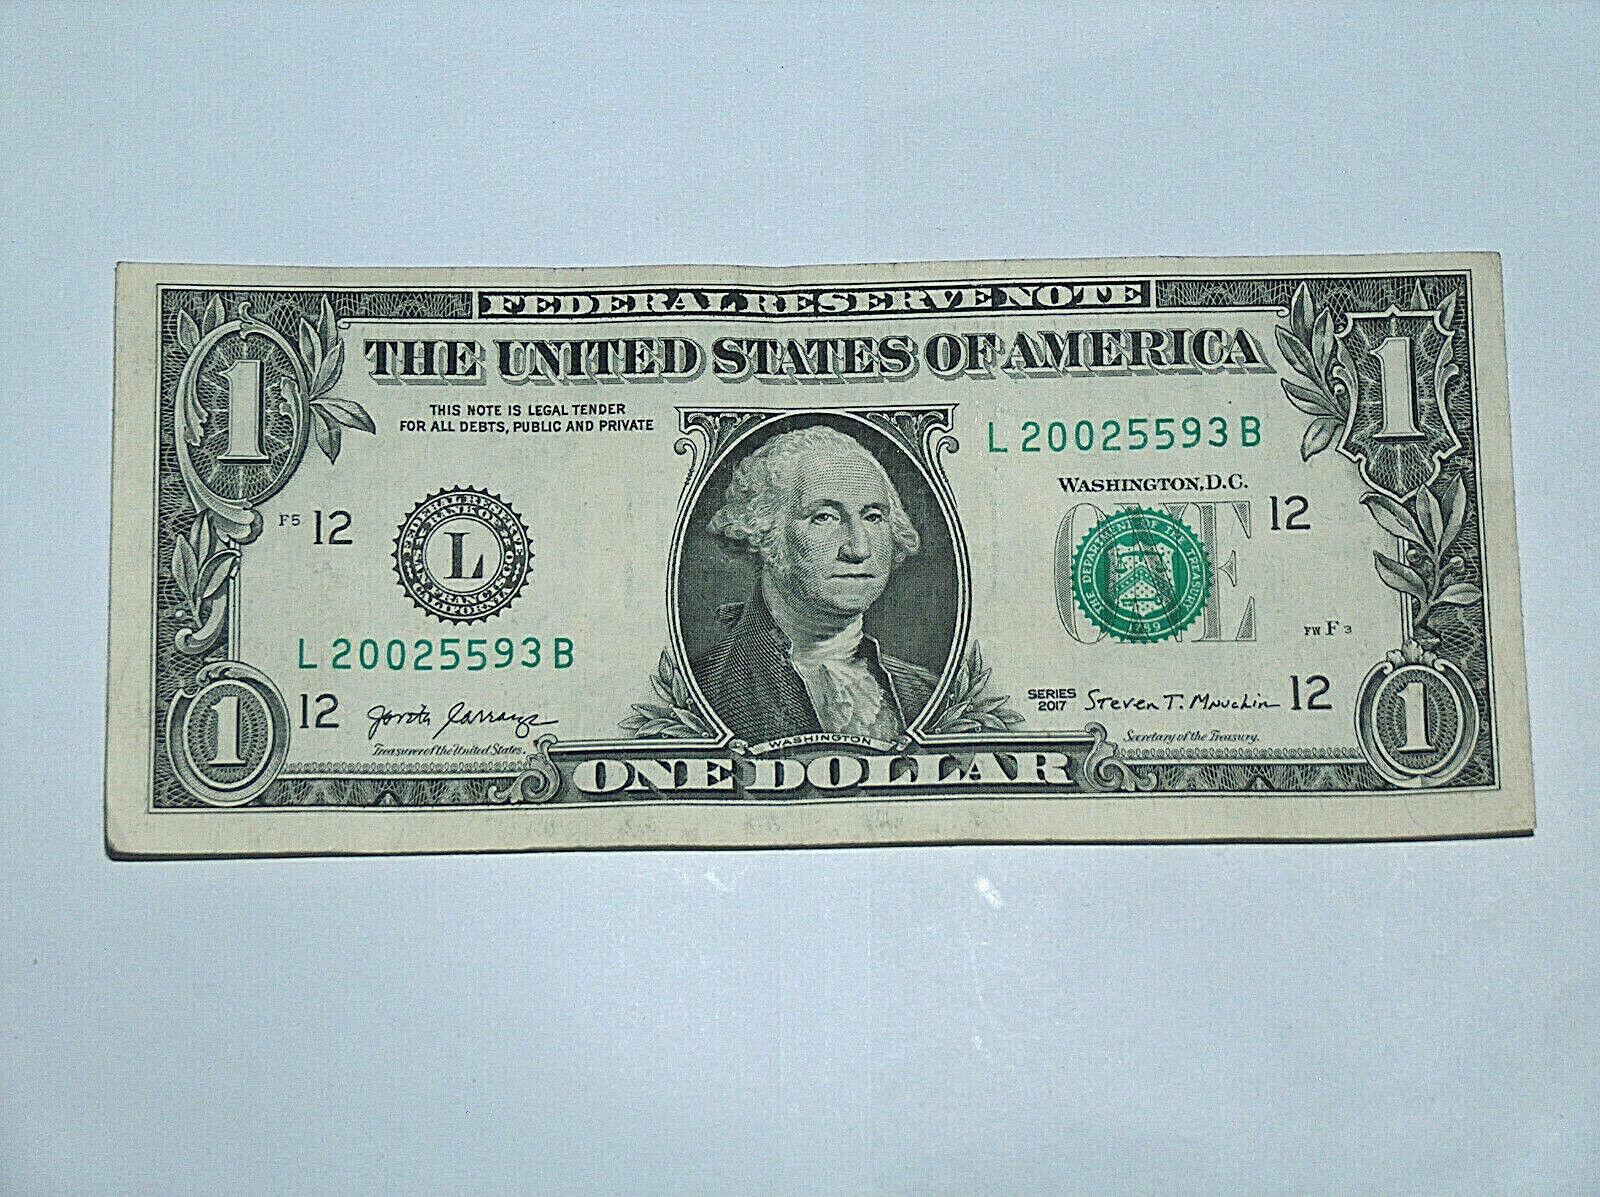 2017 $1 Dollar Bill US Bank Note Date Year Birthday 2002 5593 Fancy Money Serial